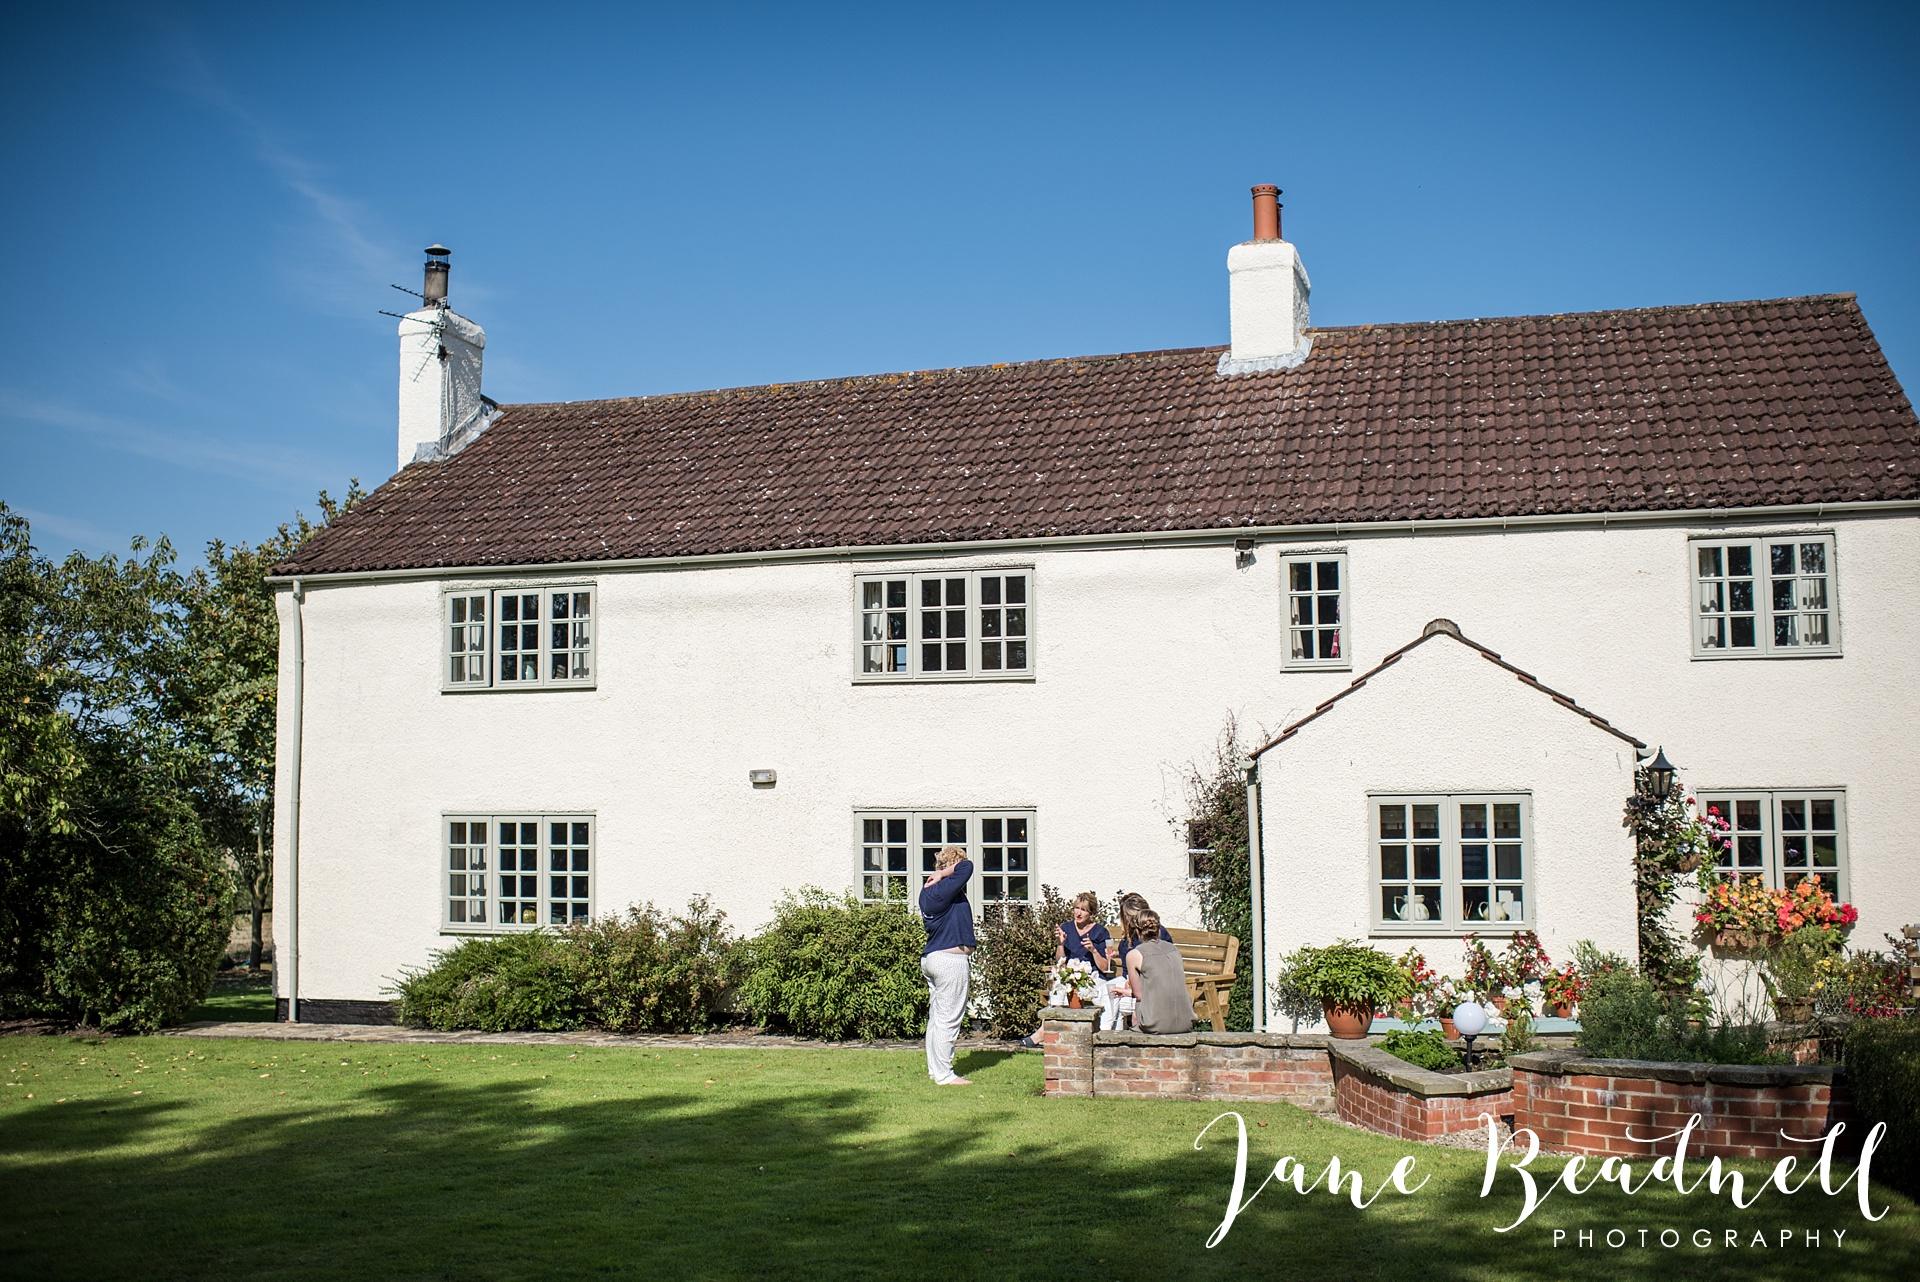 fine-art-wedding-photographer-jane-beadnell-yorkshire-wedding-photographer-garden-wedding_0010